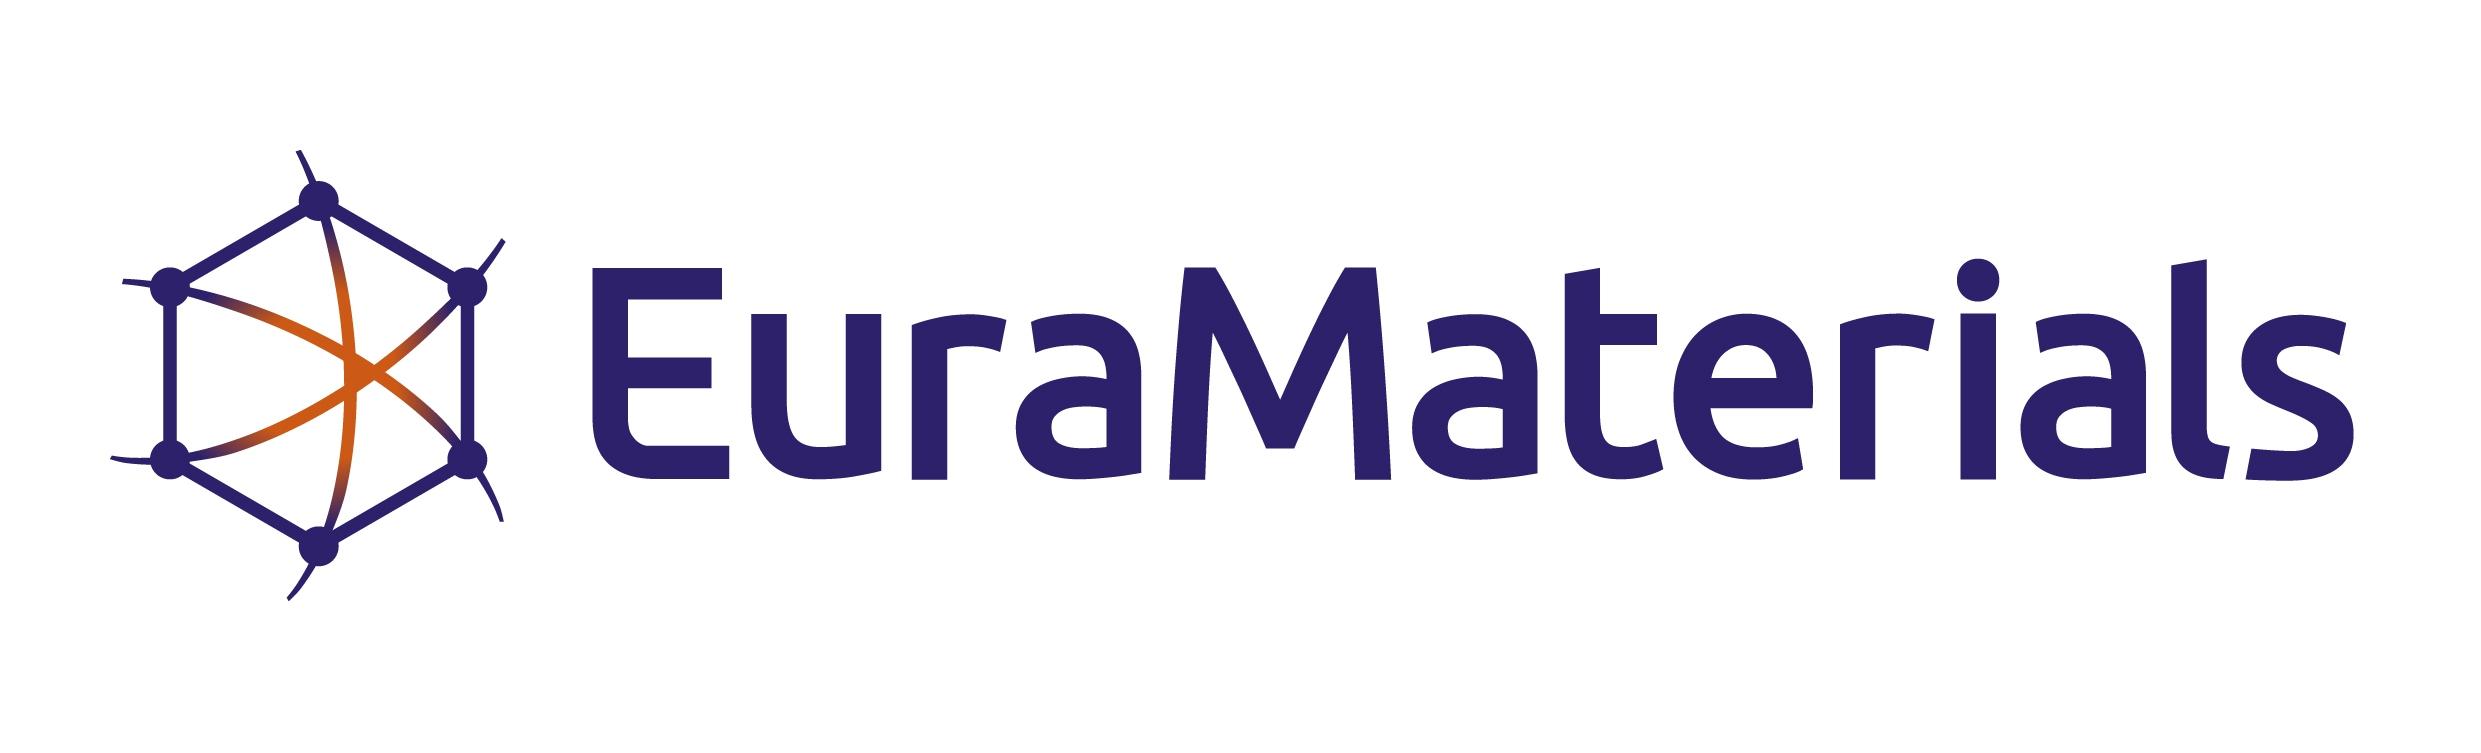 Euramaterials Logotype Rvb